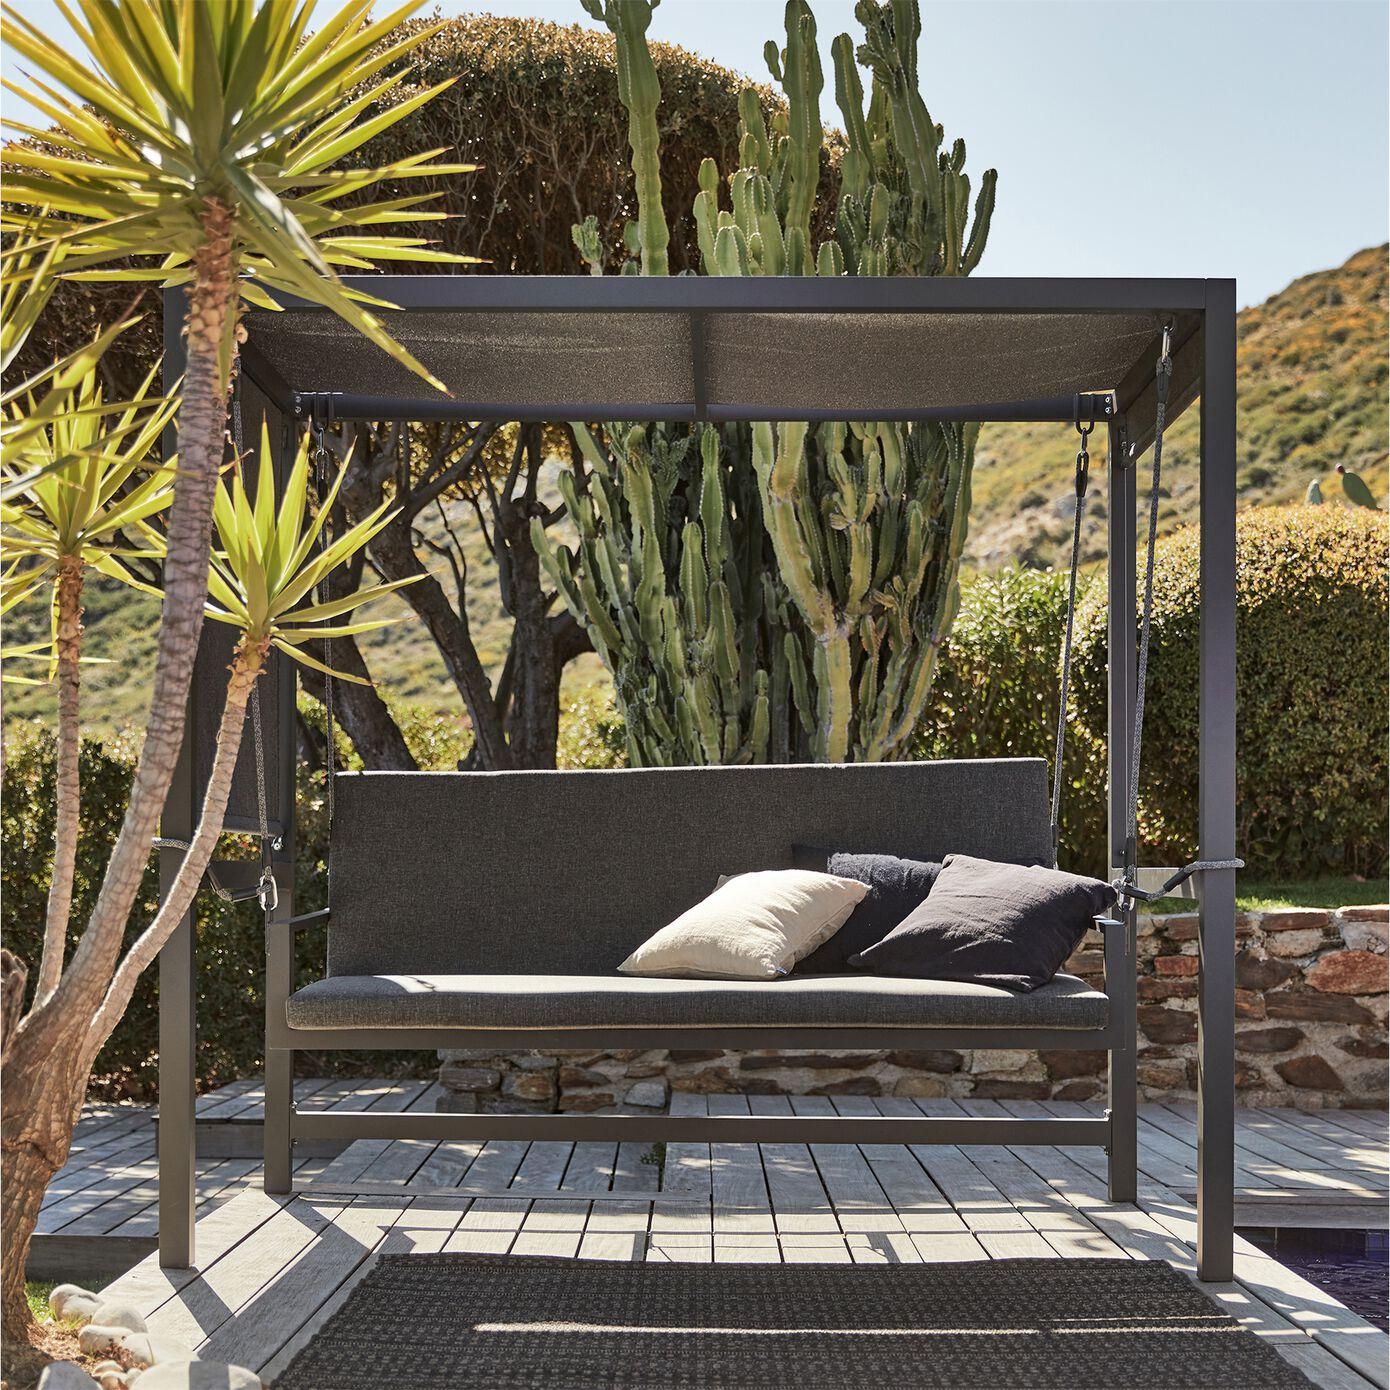 Balancelle de jardin en aluminium - blanc (3places)-BALO